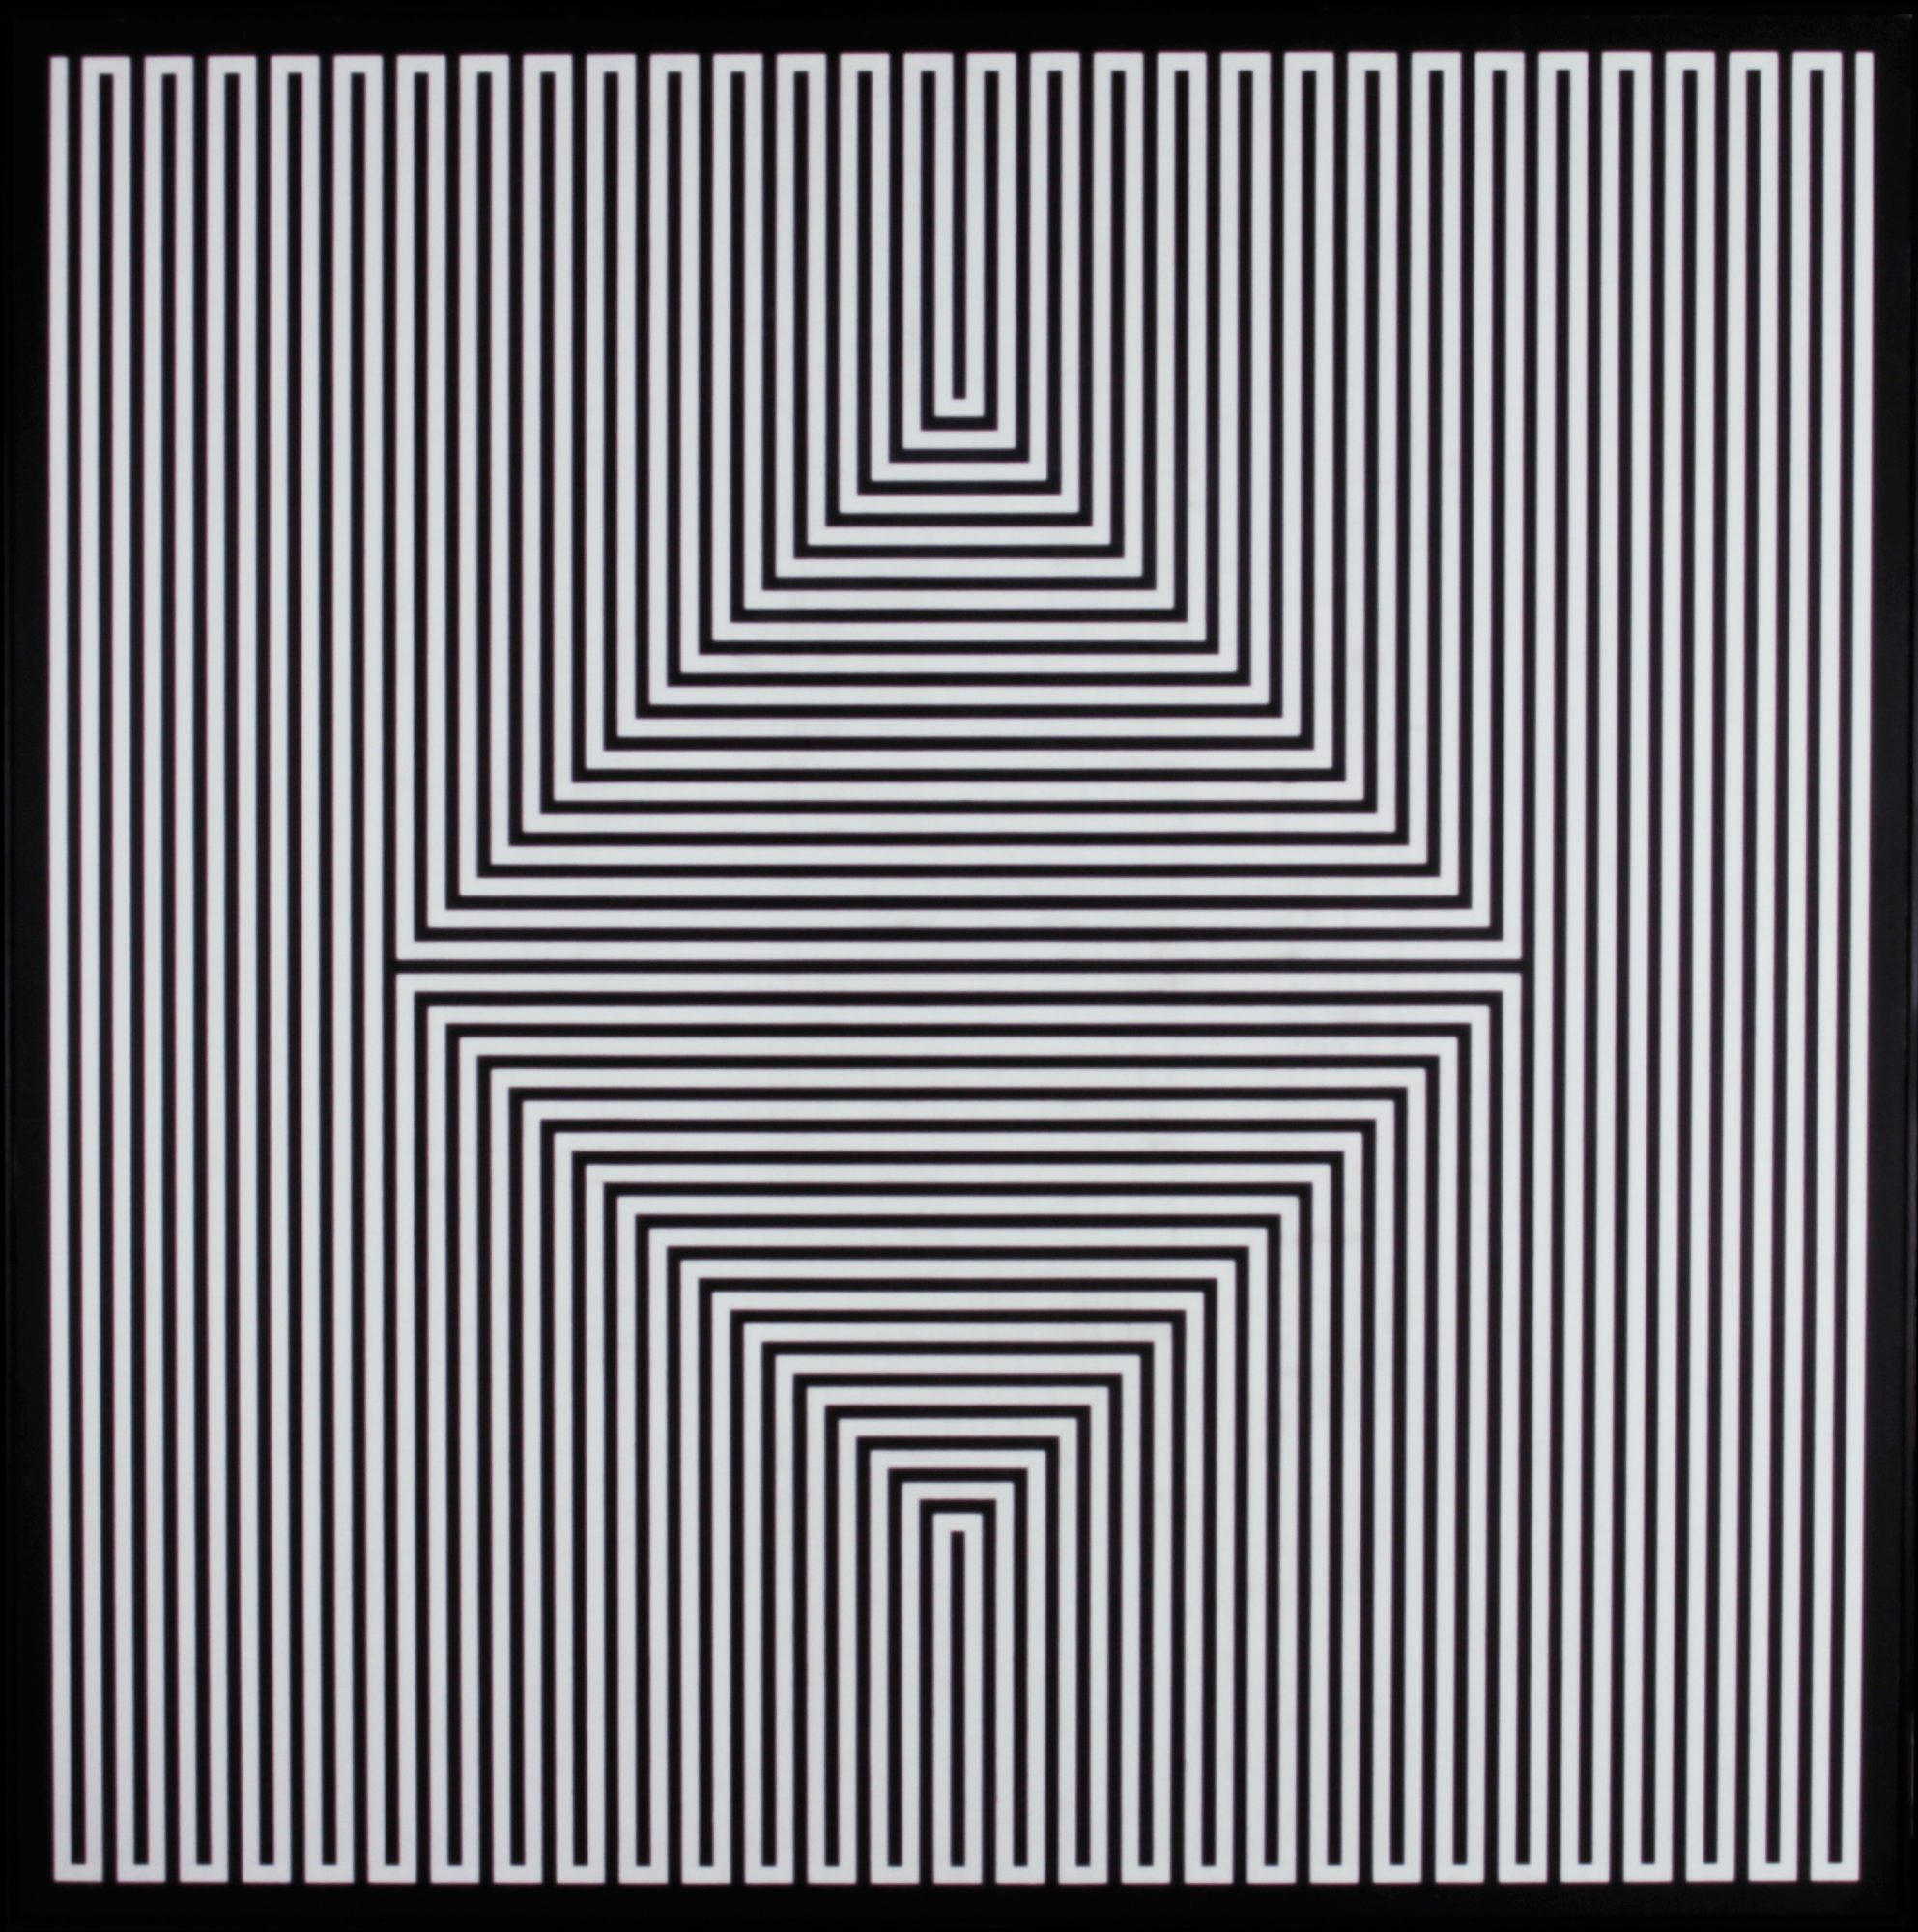 Power of Lines - Black